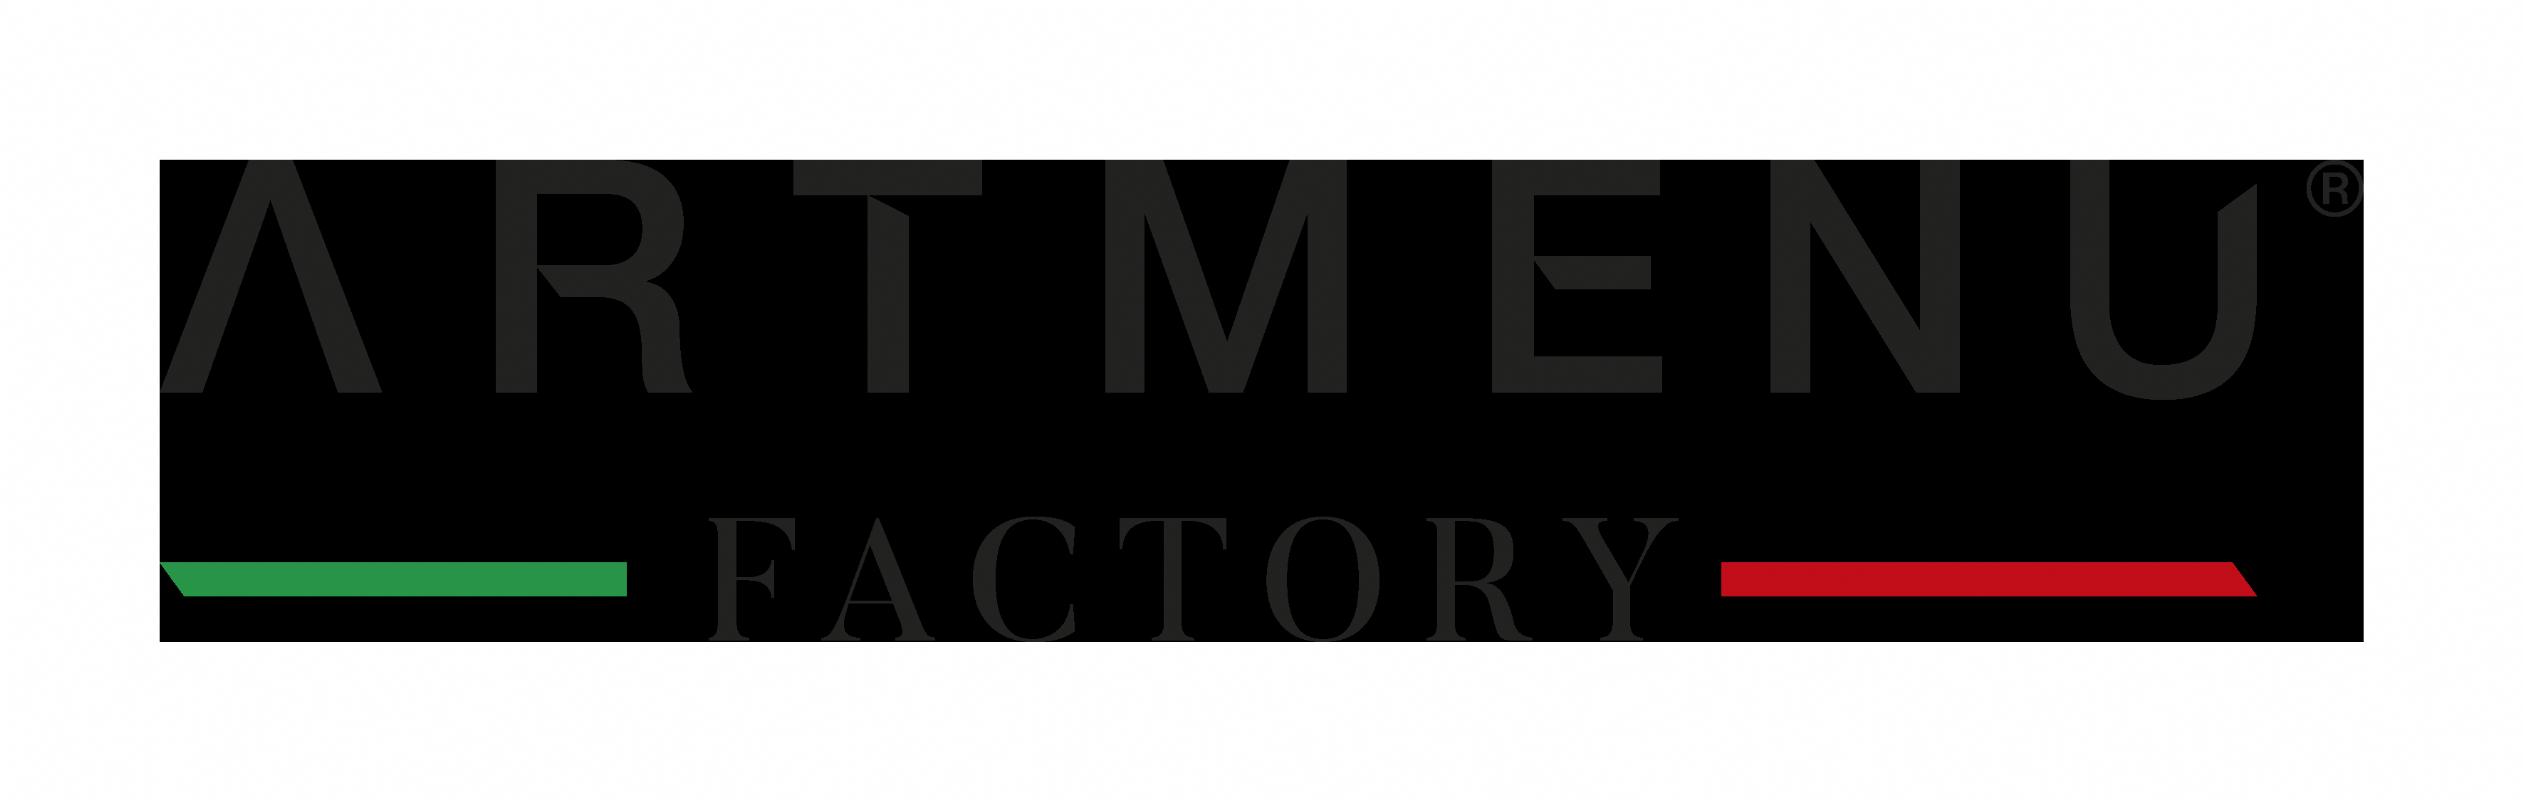 Artmenu Factory s.r.l.